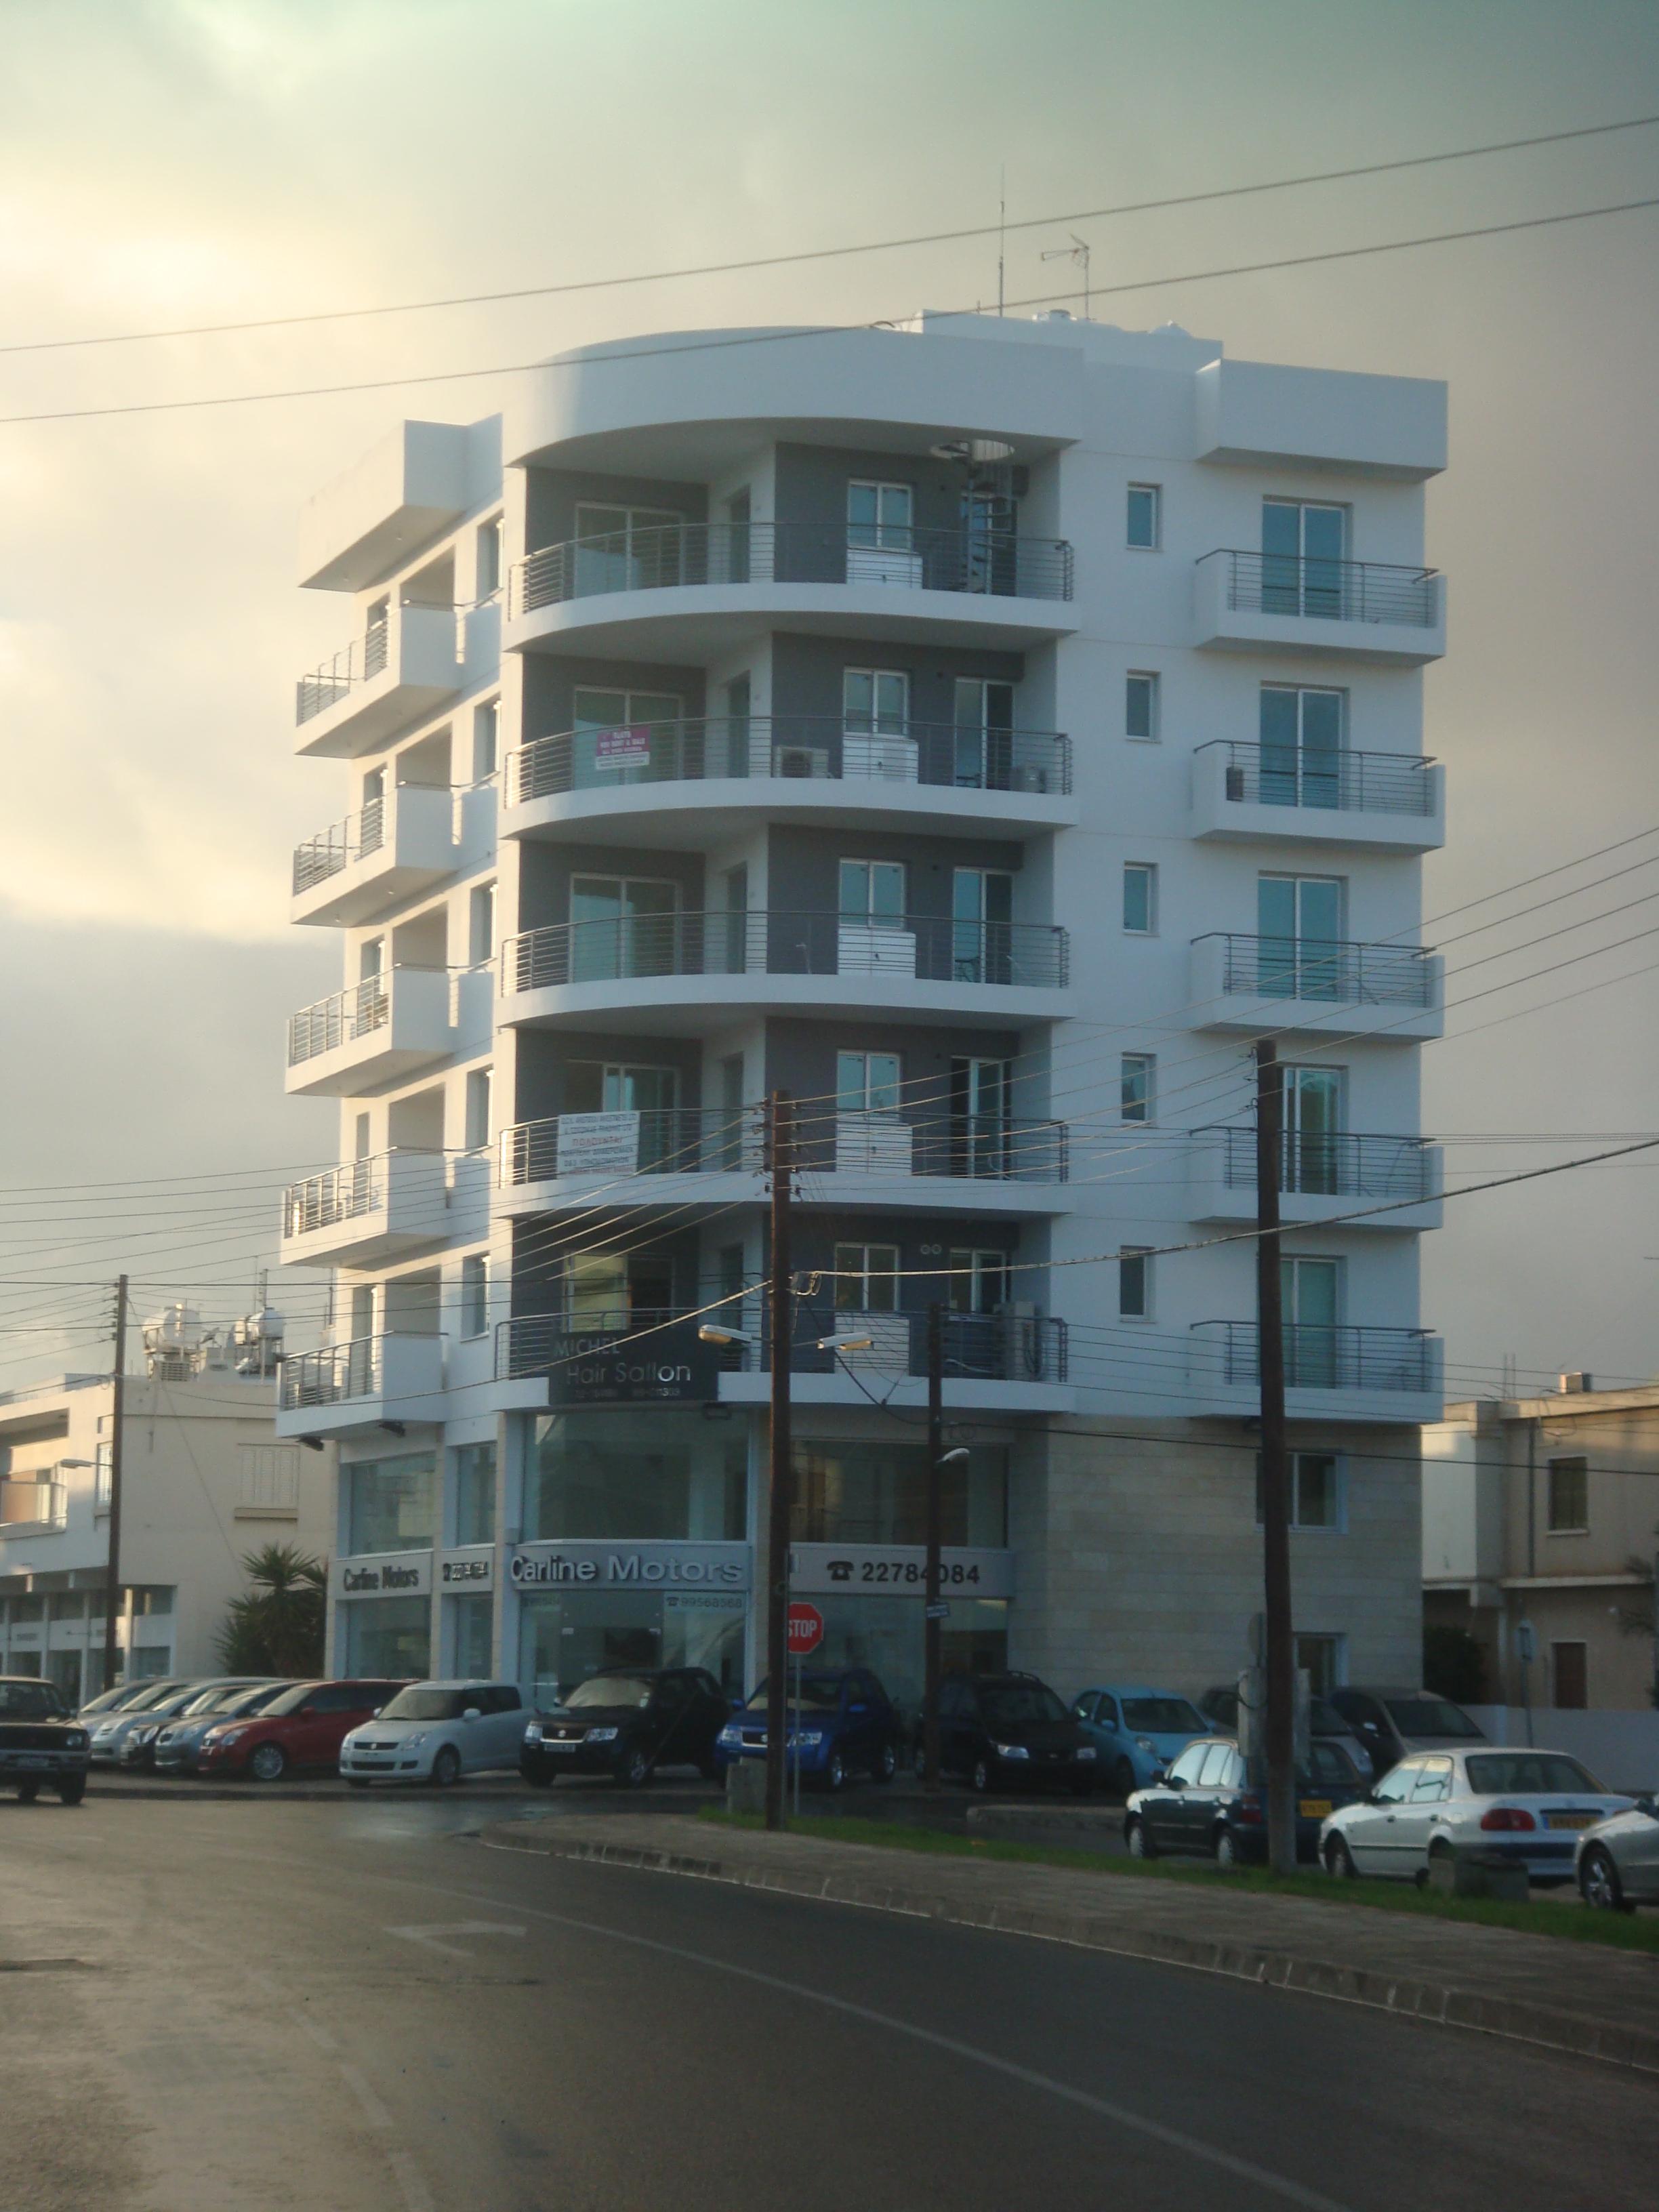 NATASA – 126 Kyriacou Matsi Avenue, 2369 Ayios Dometios, Nicosia, CYPRUS